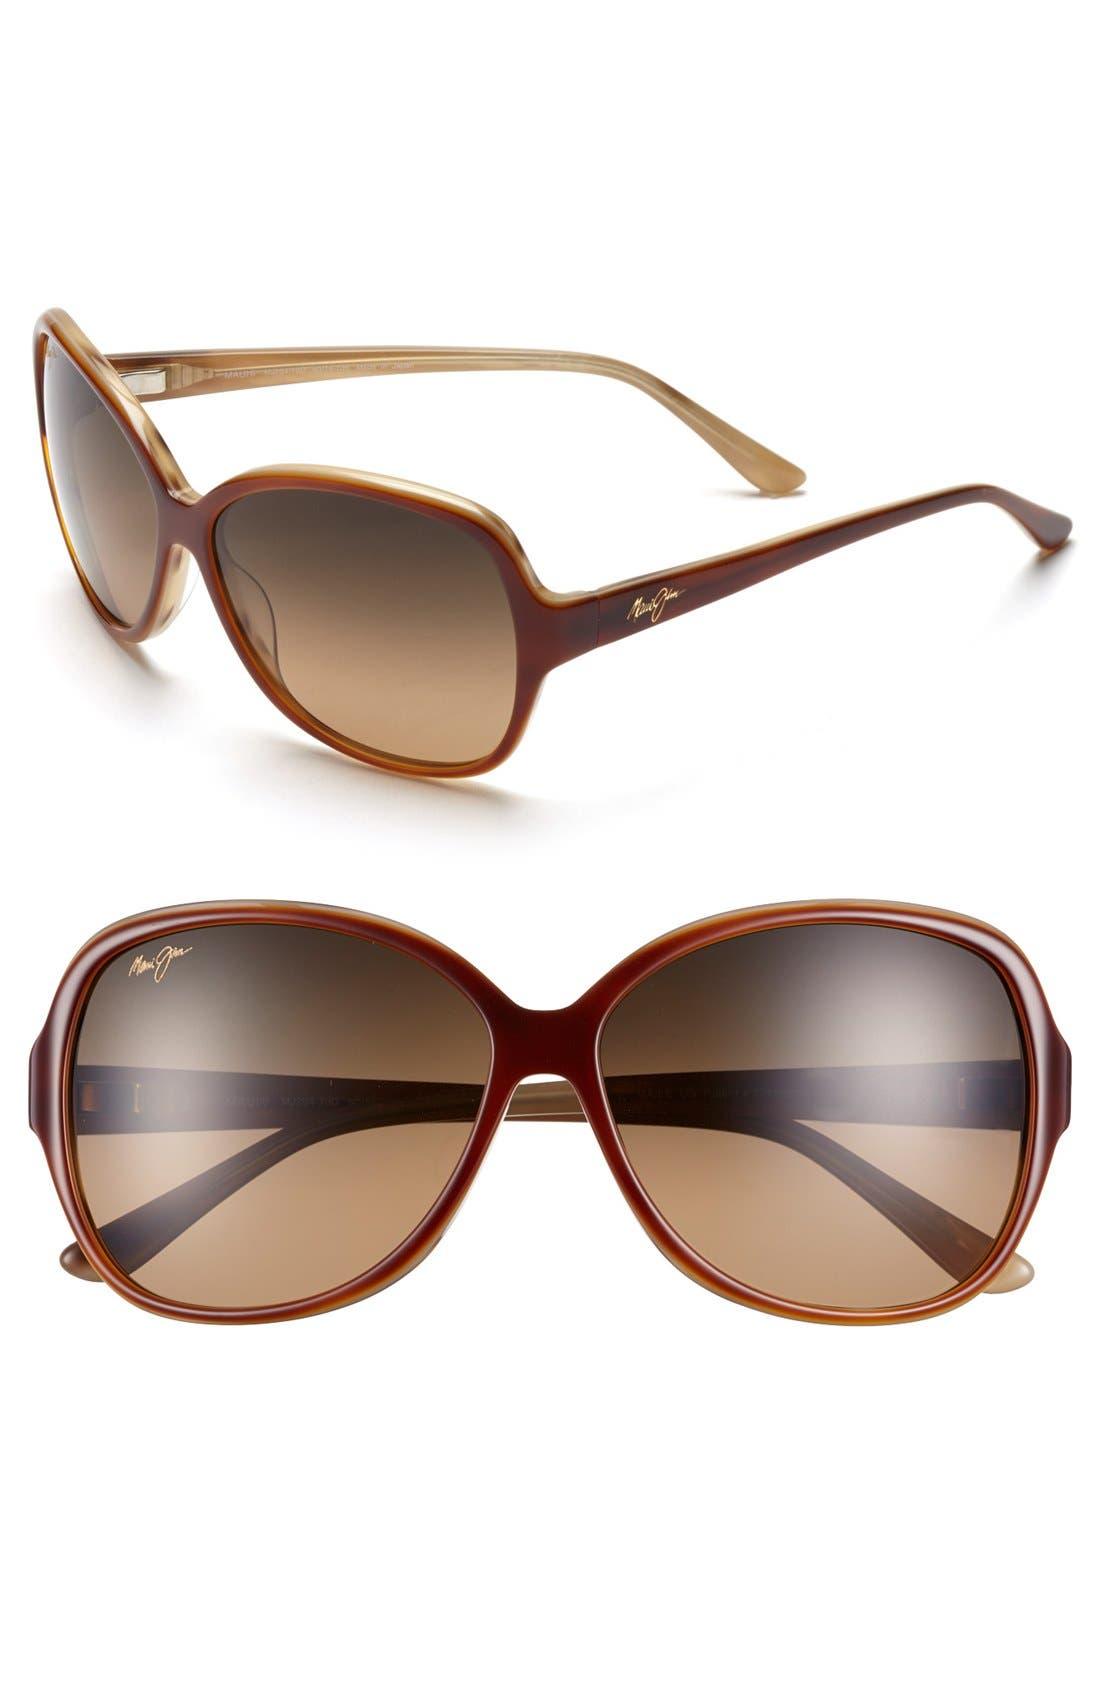 Maile 60mm PolarizedPlus<sup>®</sup> Sunglasses,                             Main thumbnail 1, color,                             Tortoise/ Ivory